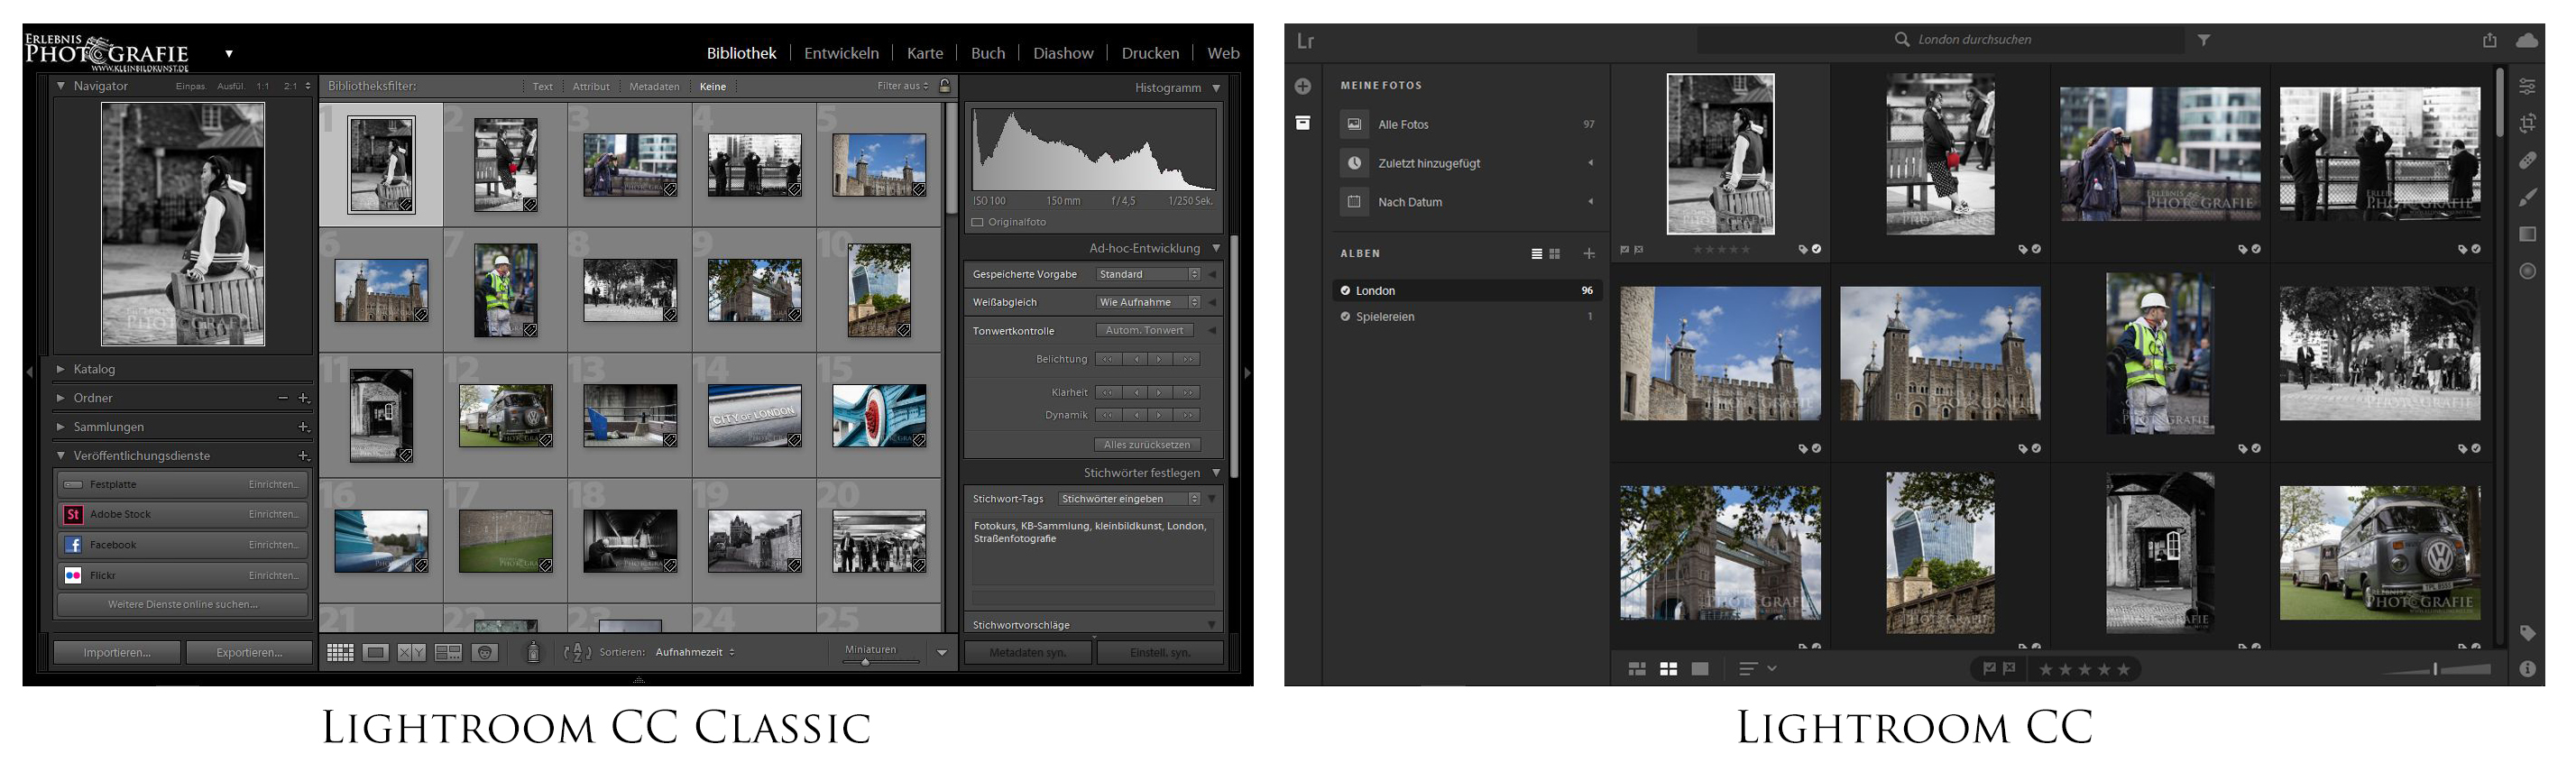 Fotokurs, Fotoblog, Lightroom, Bildbearbeitung